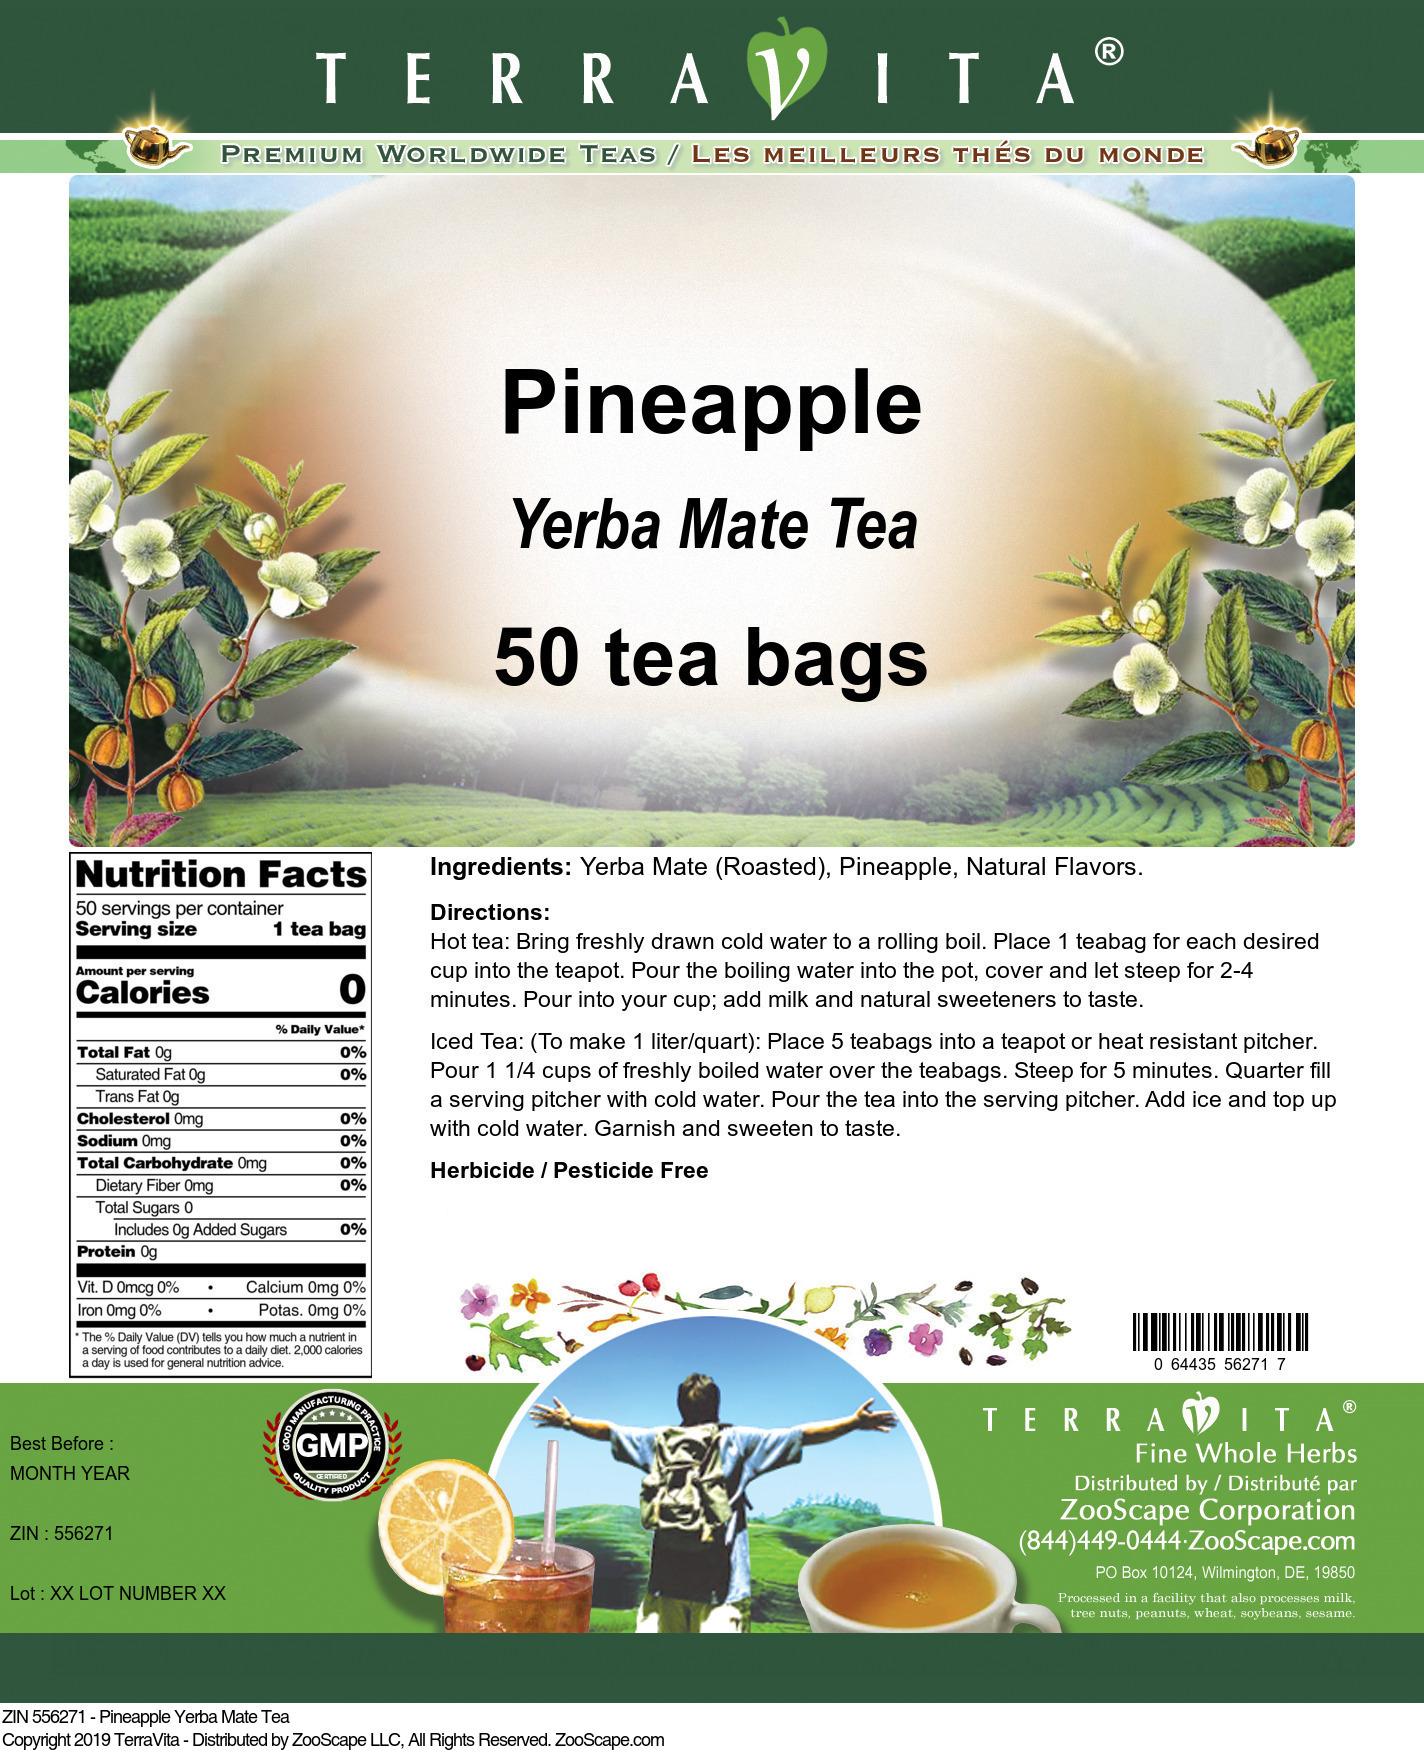 Pineapple Yerba Mate Tea